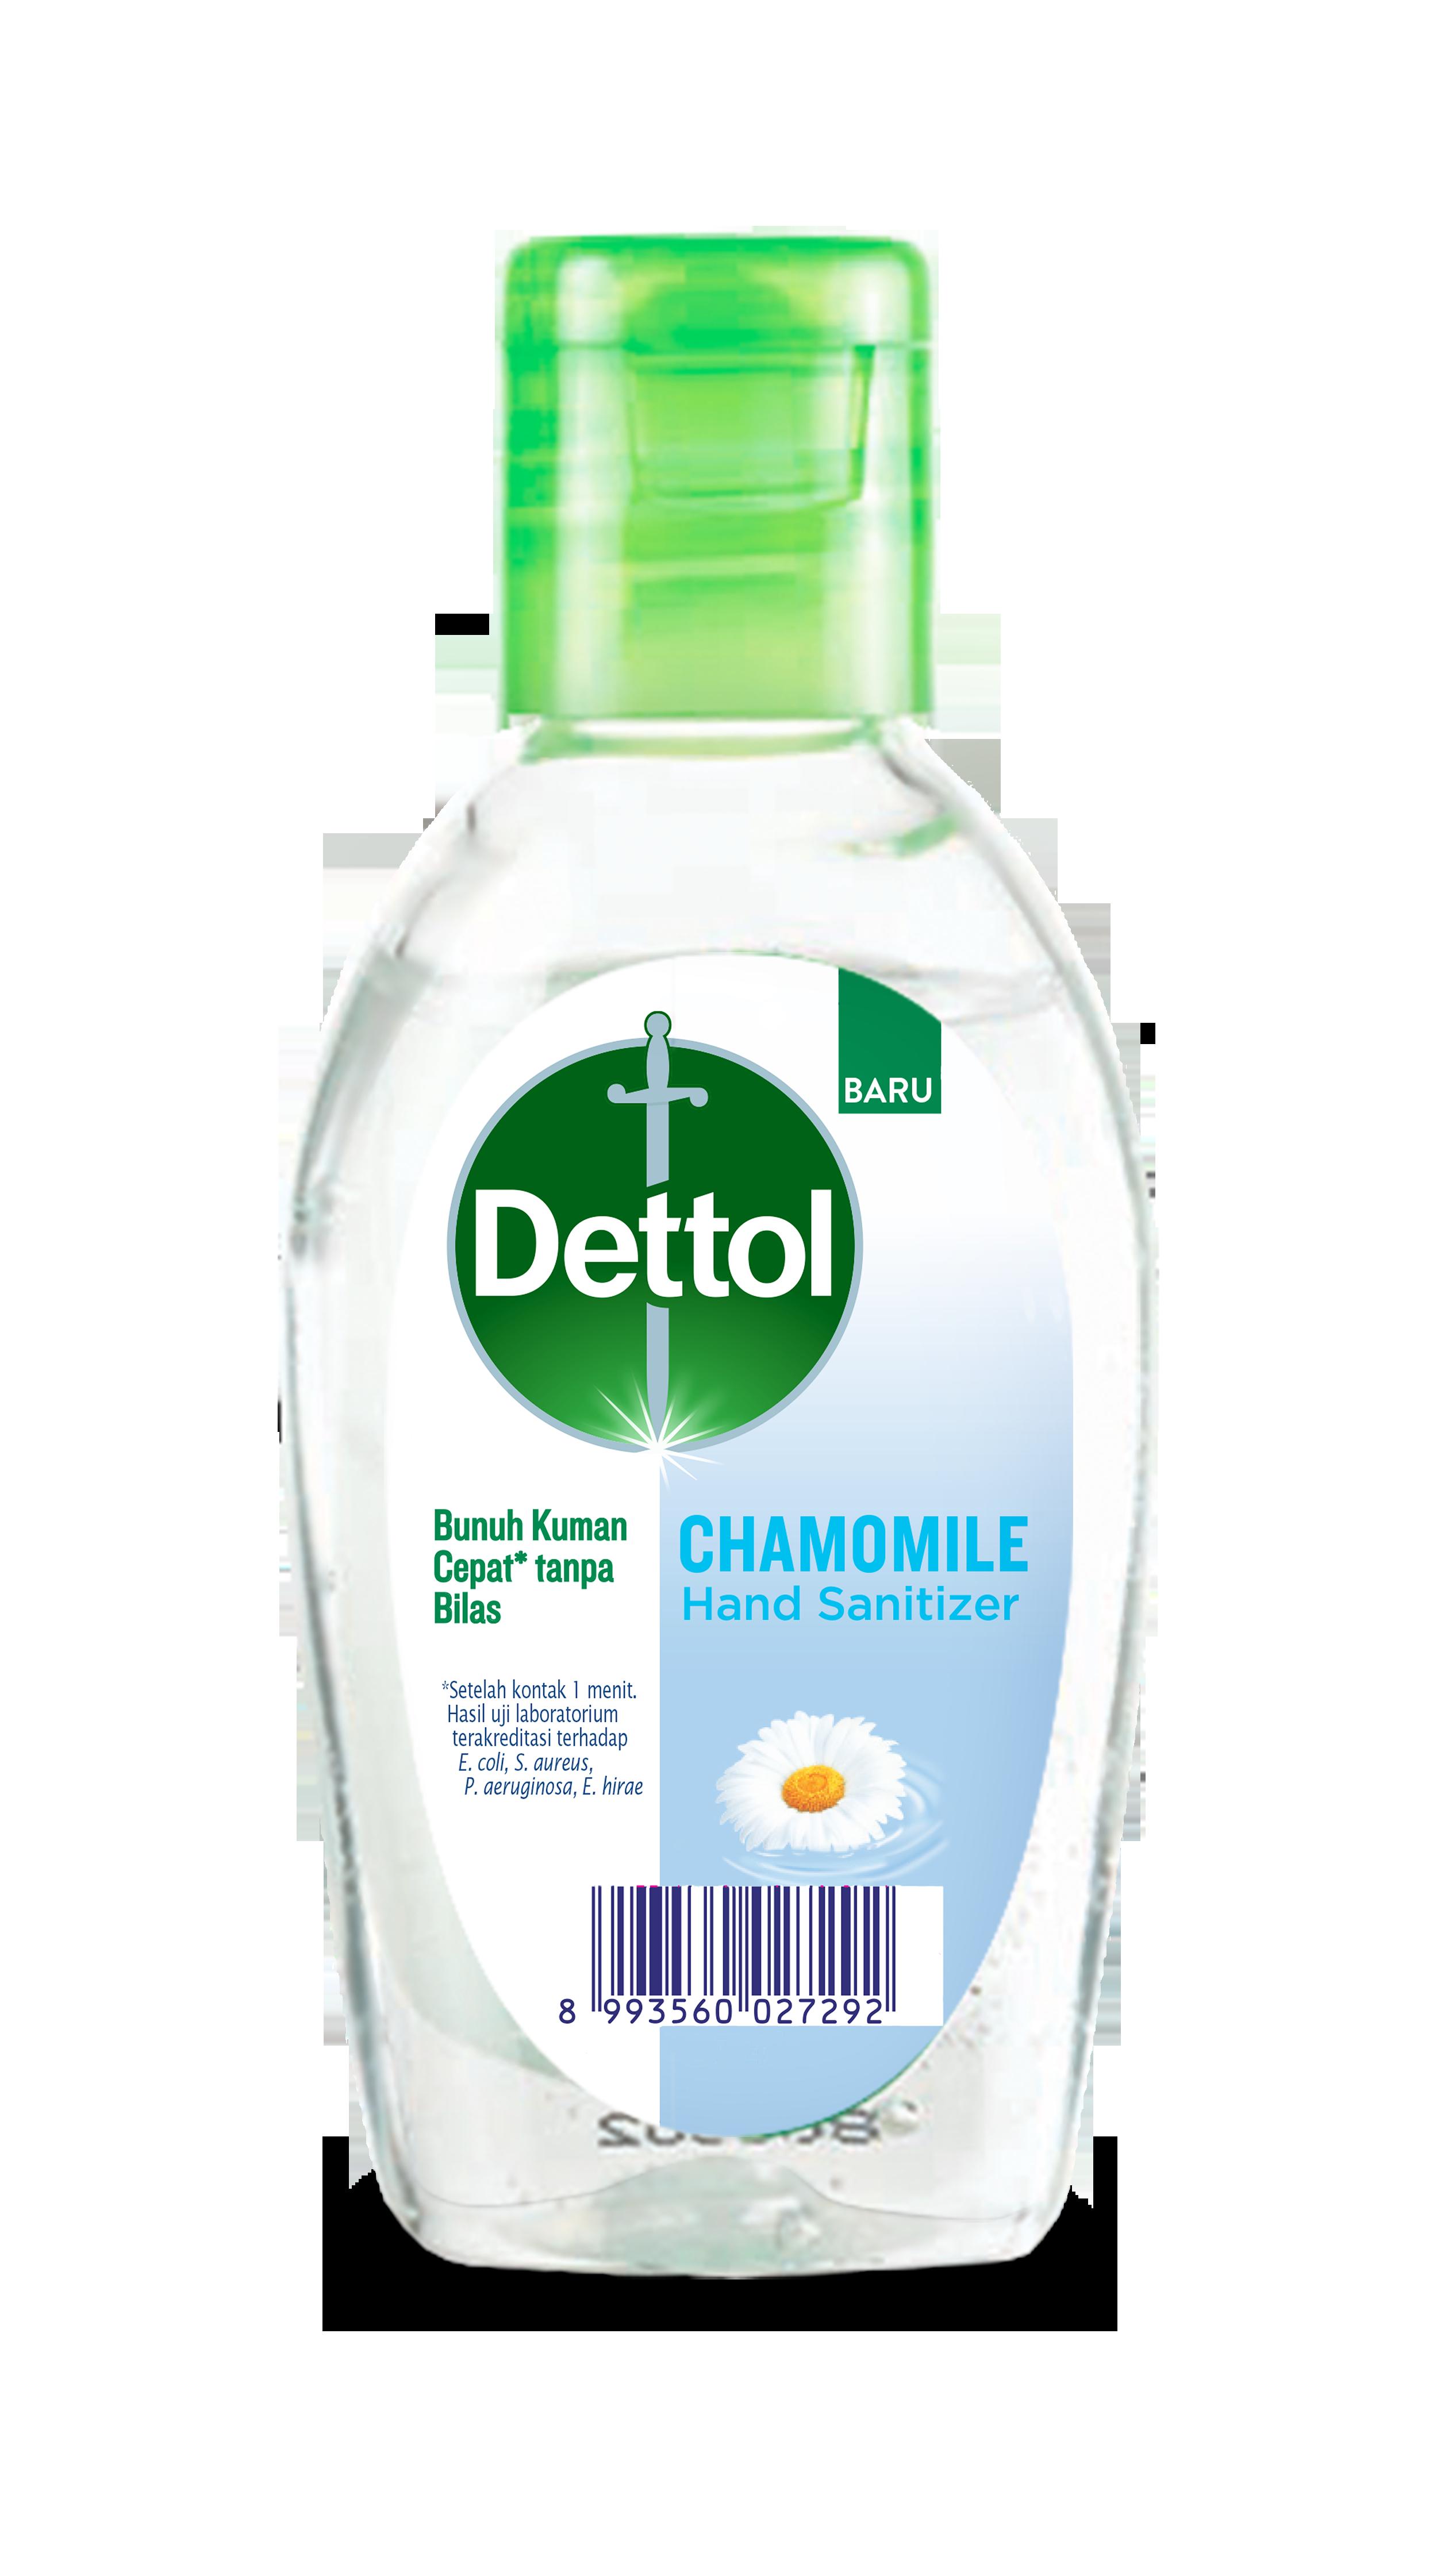 Dettol Instant Hand Sanitizer Soothe